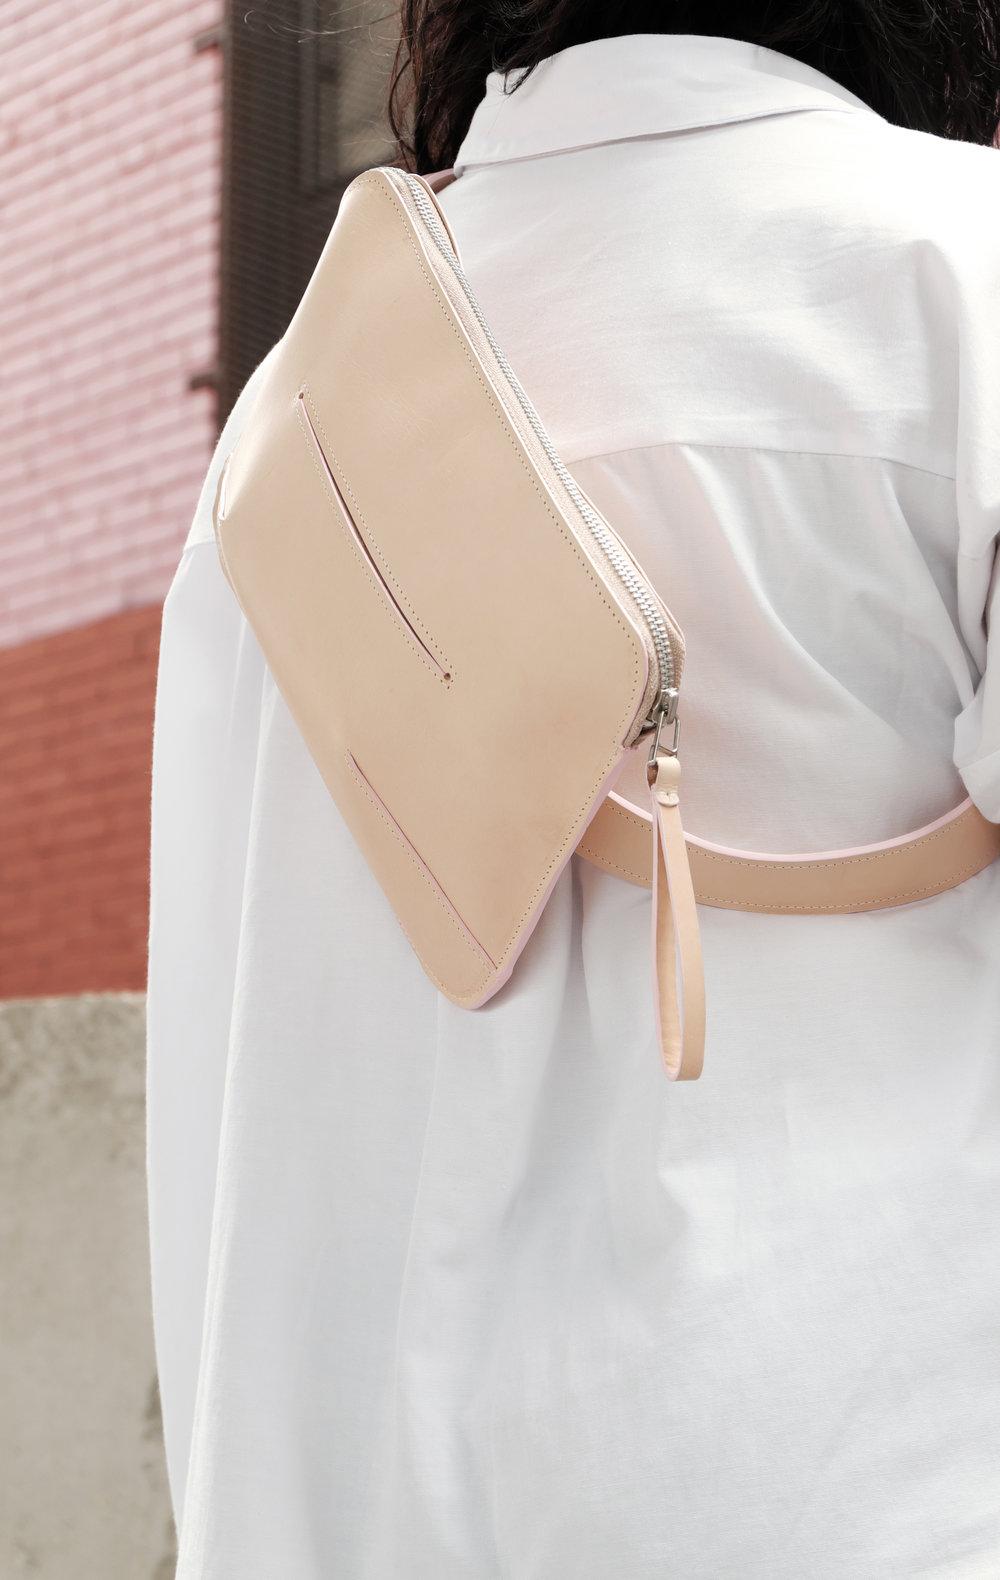 Hermann - Leather messenger bag in nude